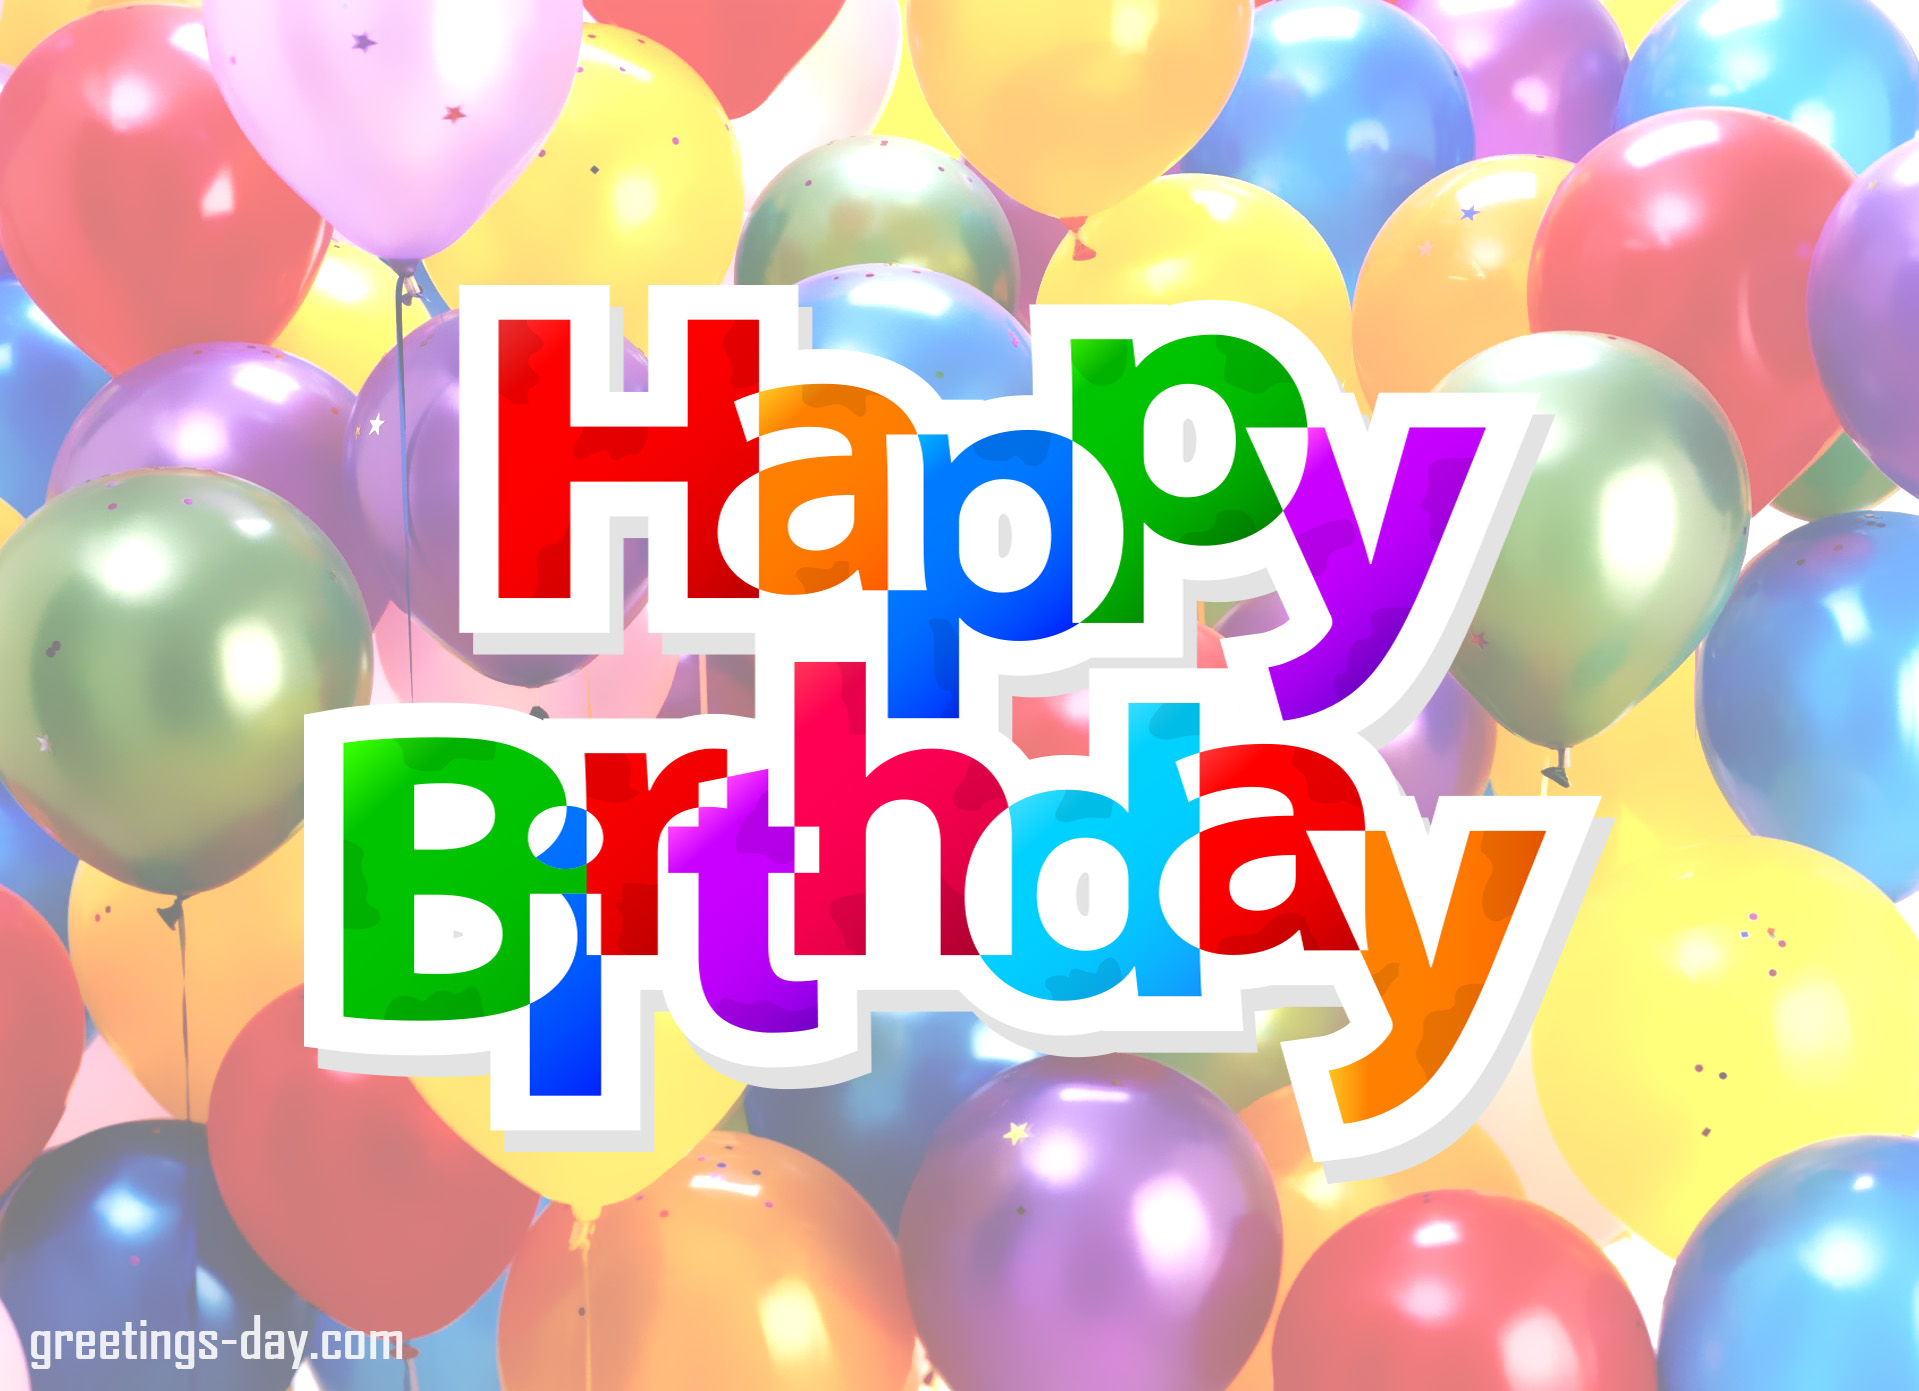 Free Greeting Cards Birthday gangcraftnet – Free Online Animated Birthday Cards